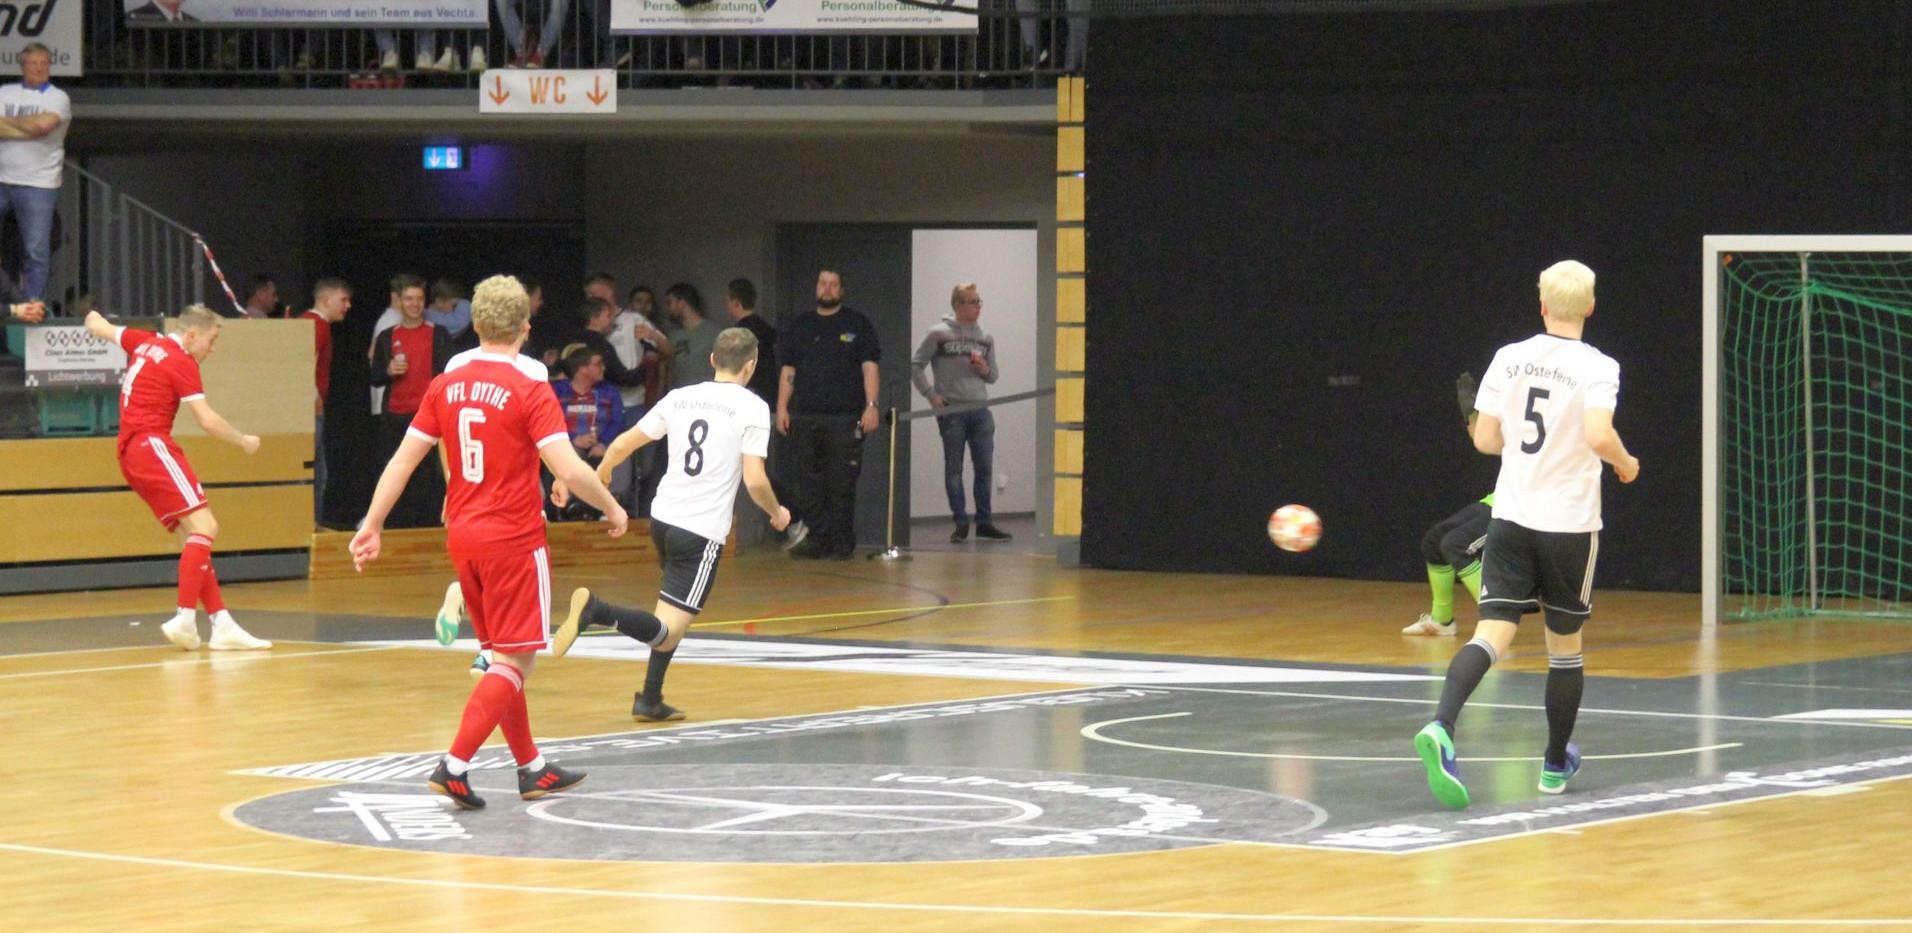 OV-Supercup-201219-006.jpg